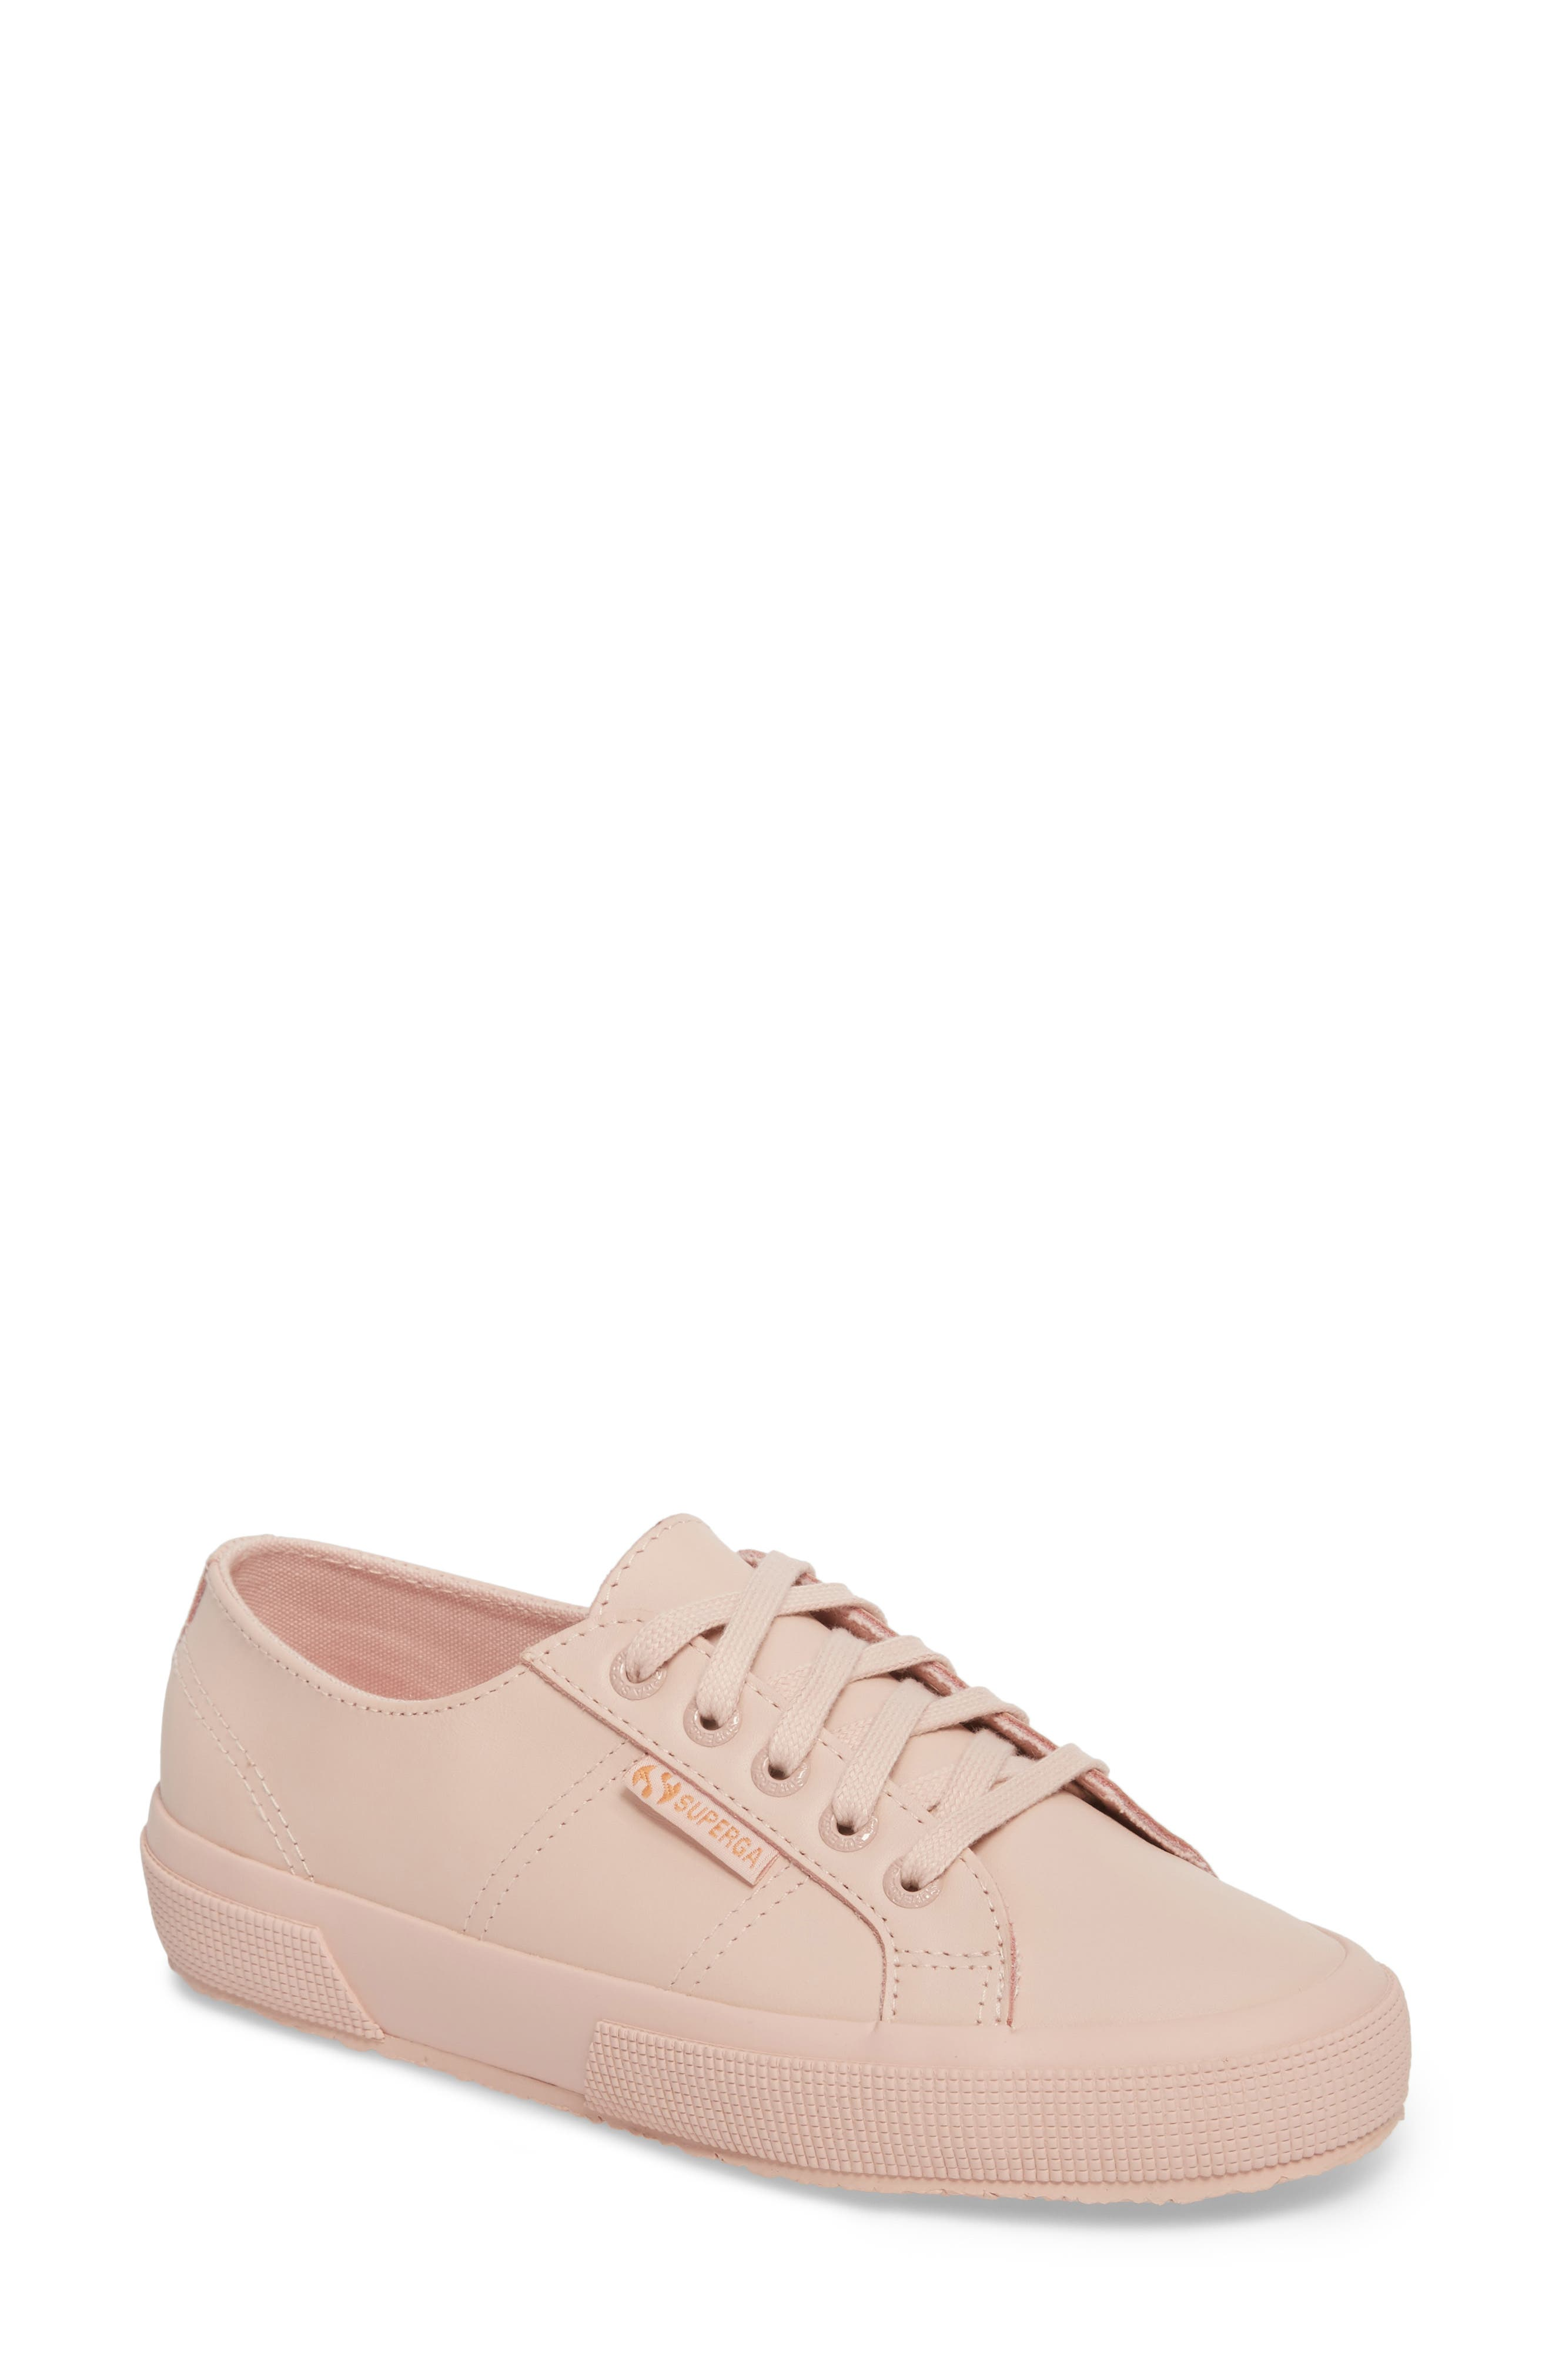 Alternate Image 1 Selected - Superga '2750' Sneaker (Women)